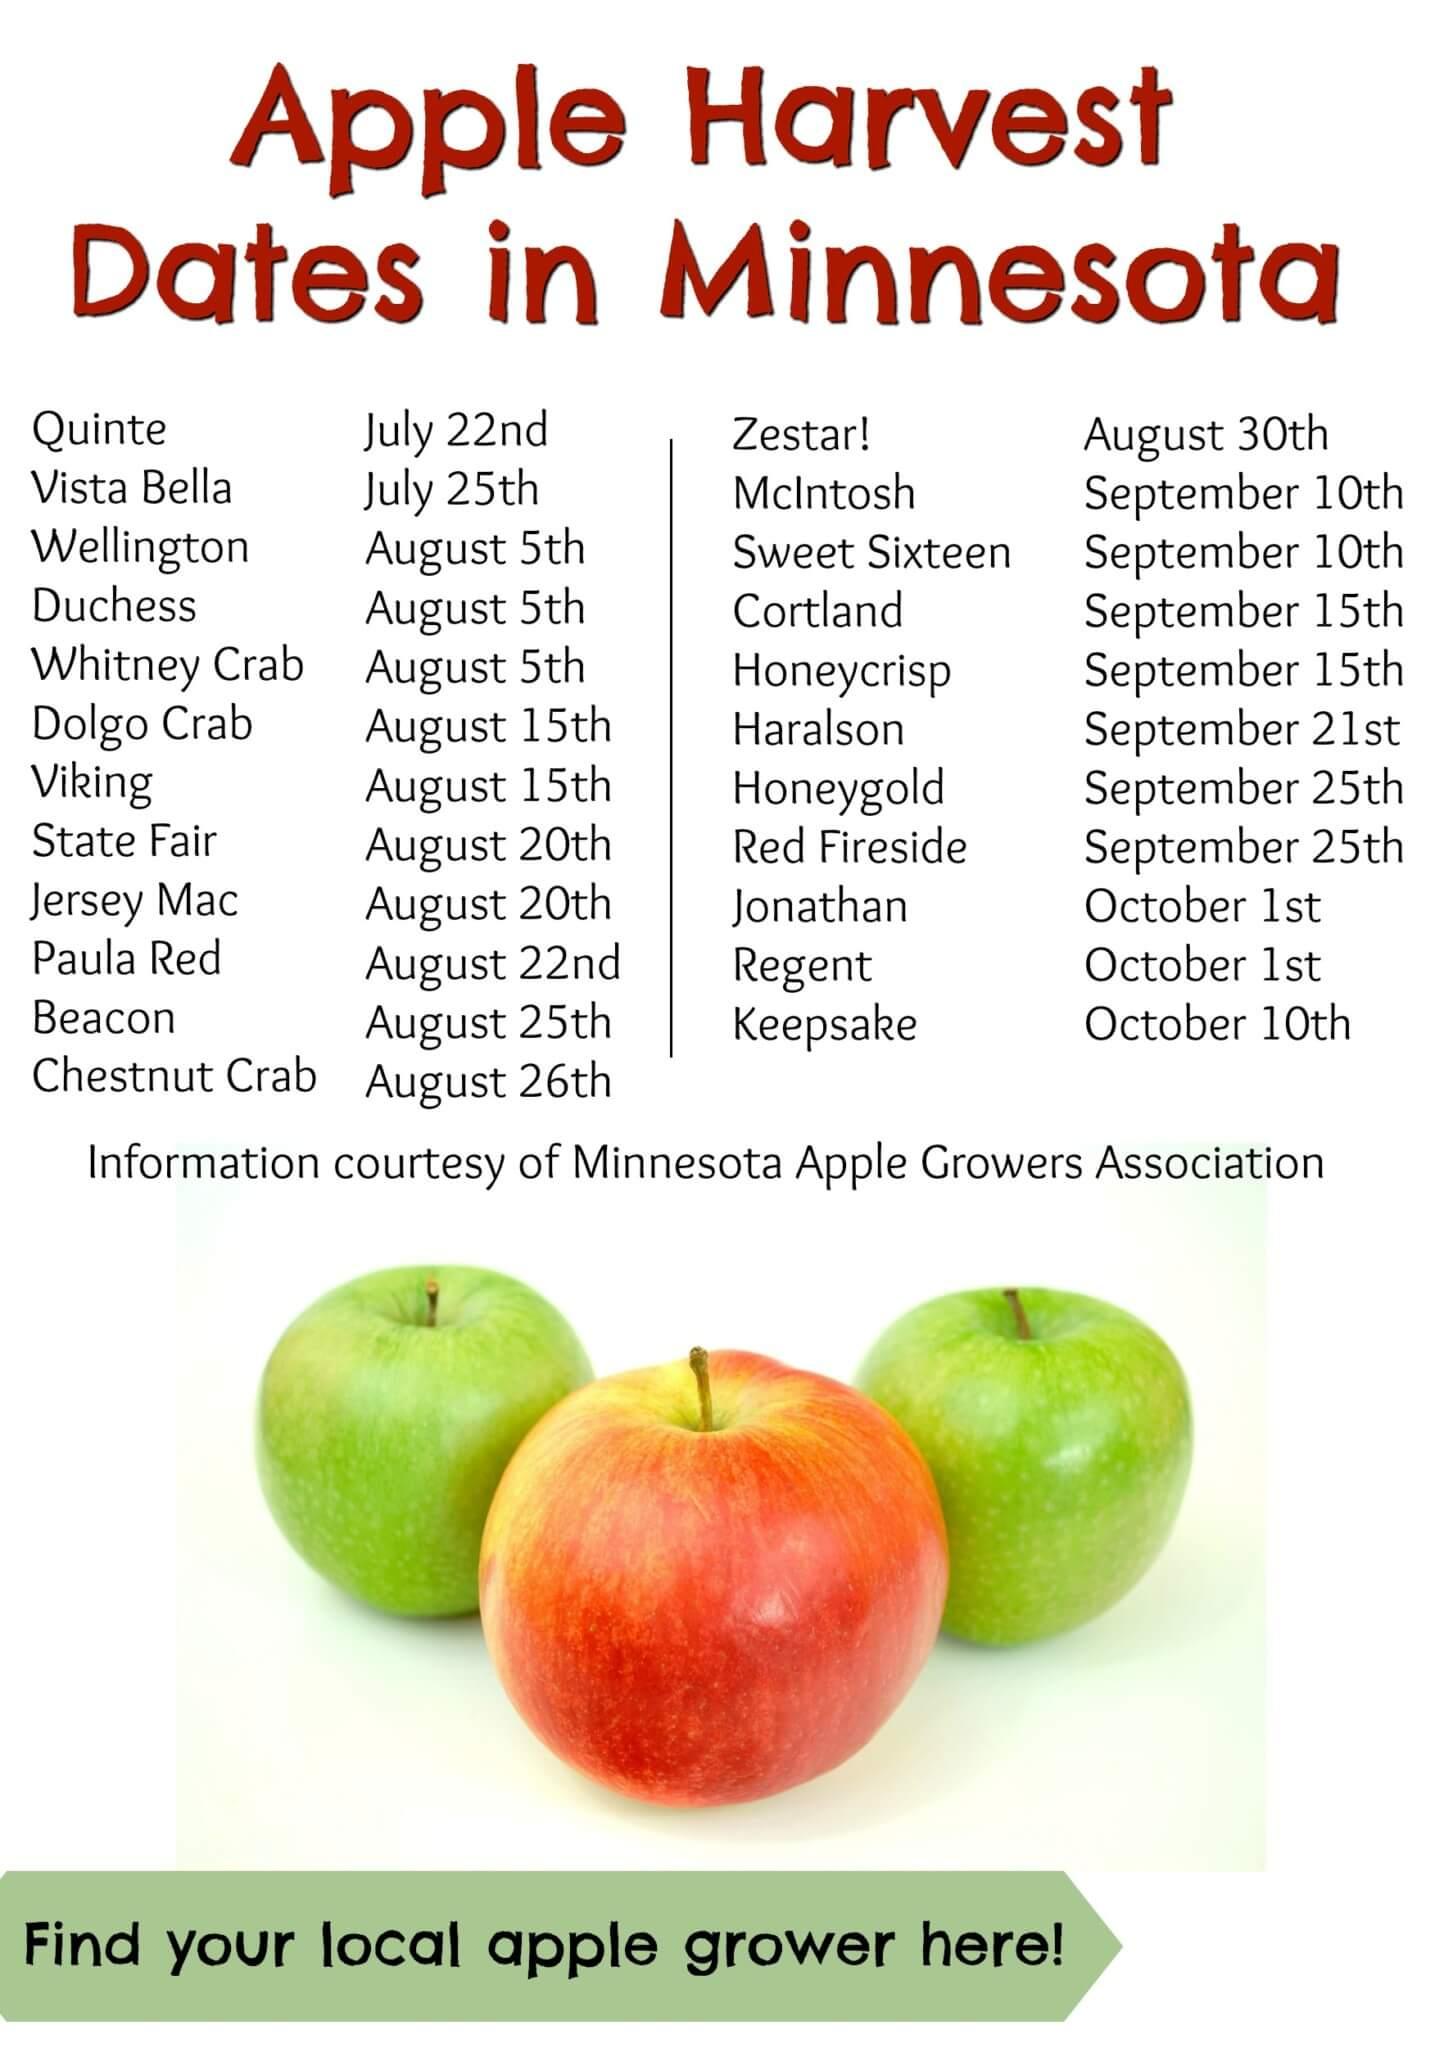 apple-harvest-dates-in-minnesota